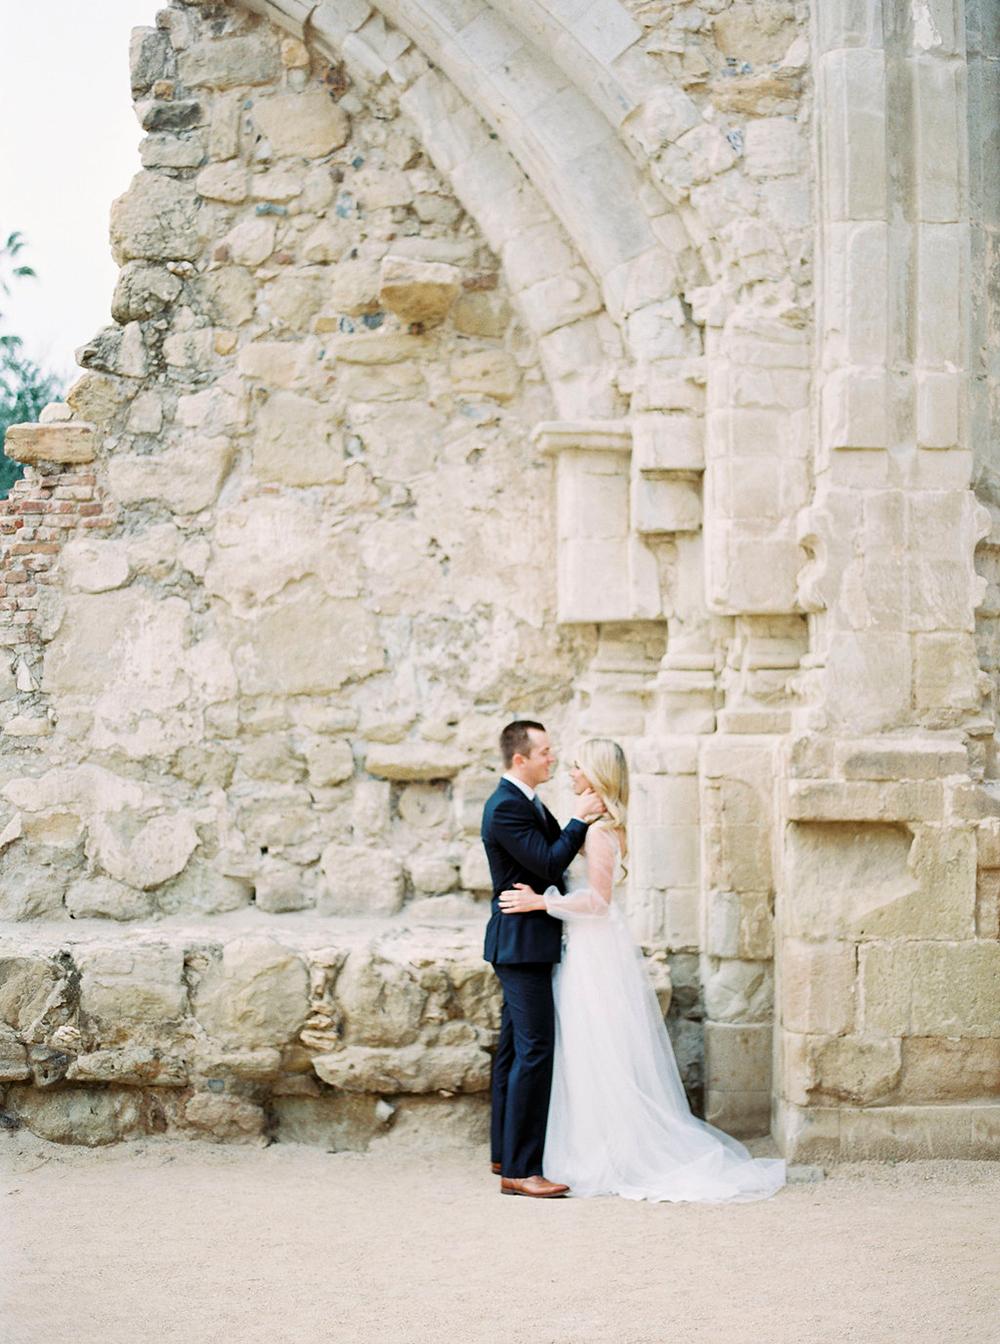 wedding photography - photo by Amanda Lenhardt https://ruffledblog.com/relaxed-san-juan-capistrano-wedding-inspiration